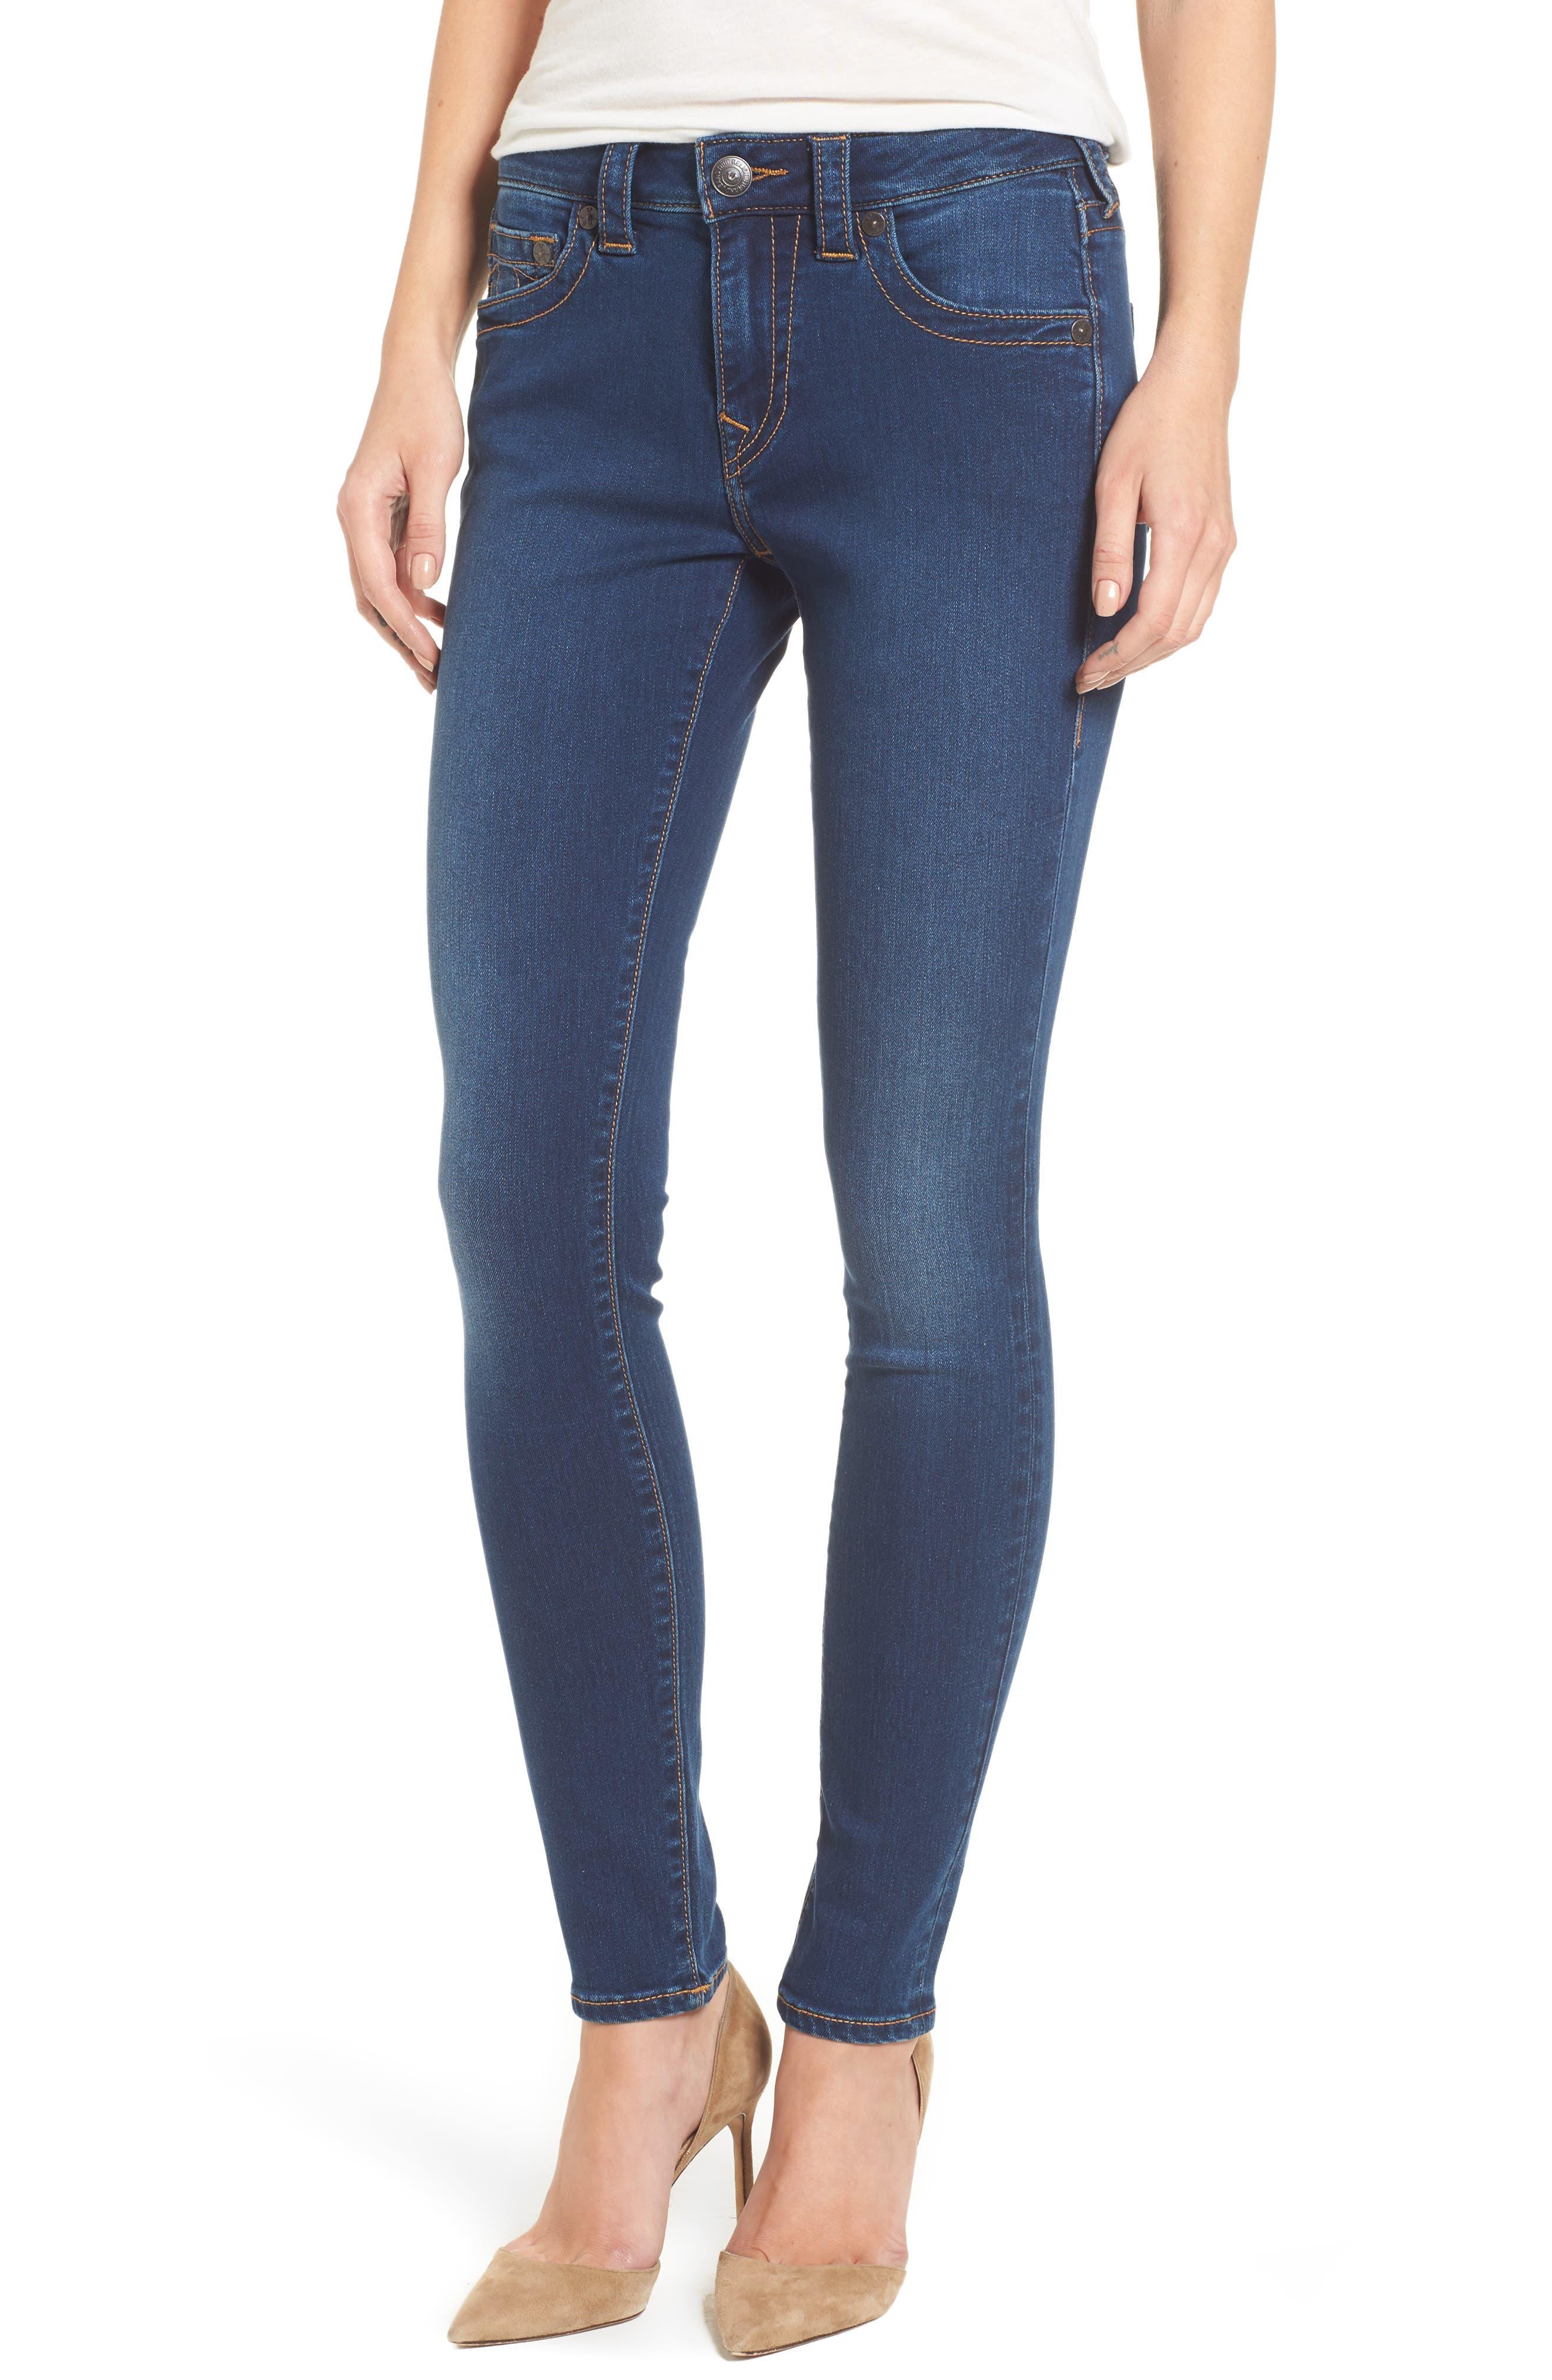 Jennie Curvy Skinny Jeans,                             Main thumbnail 1, color,                             Lands End Indigo